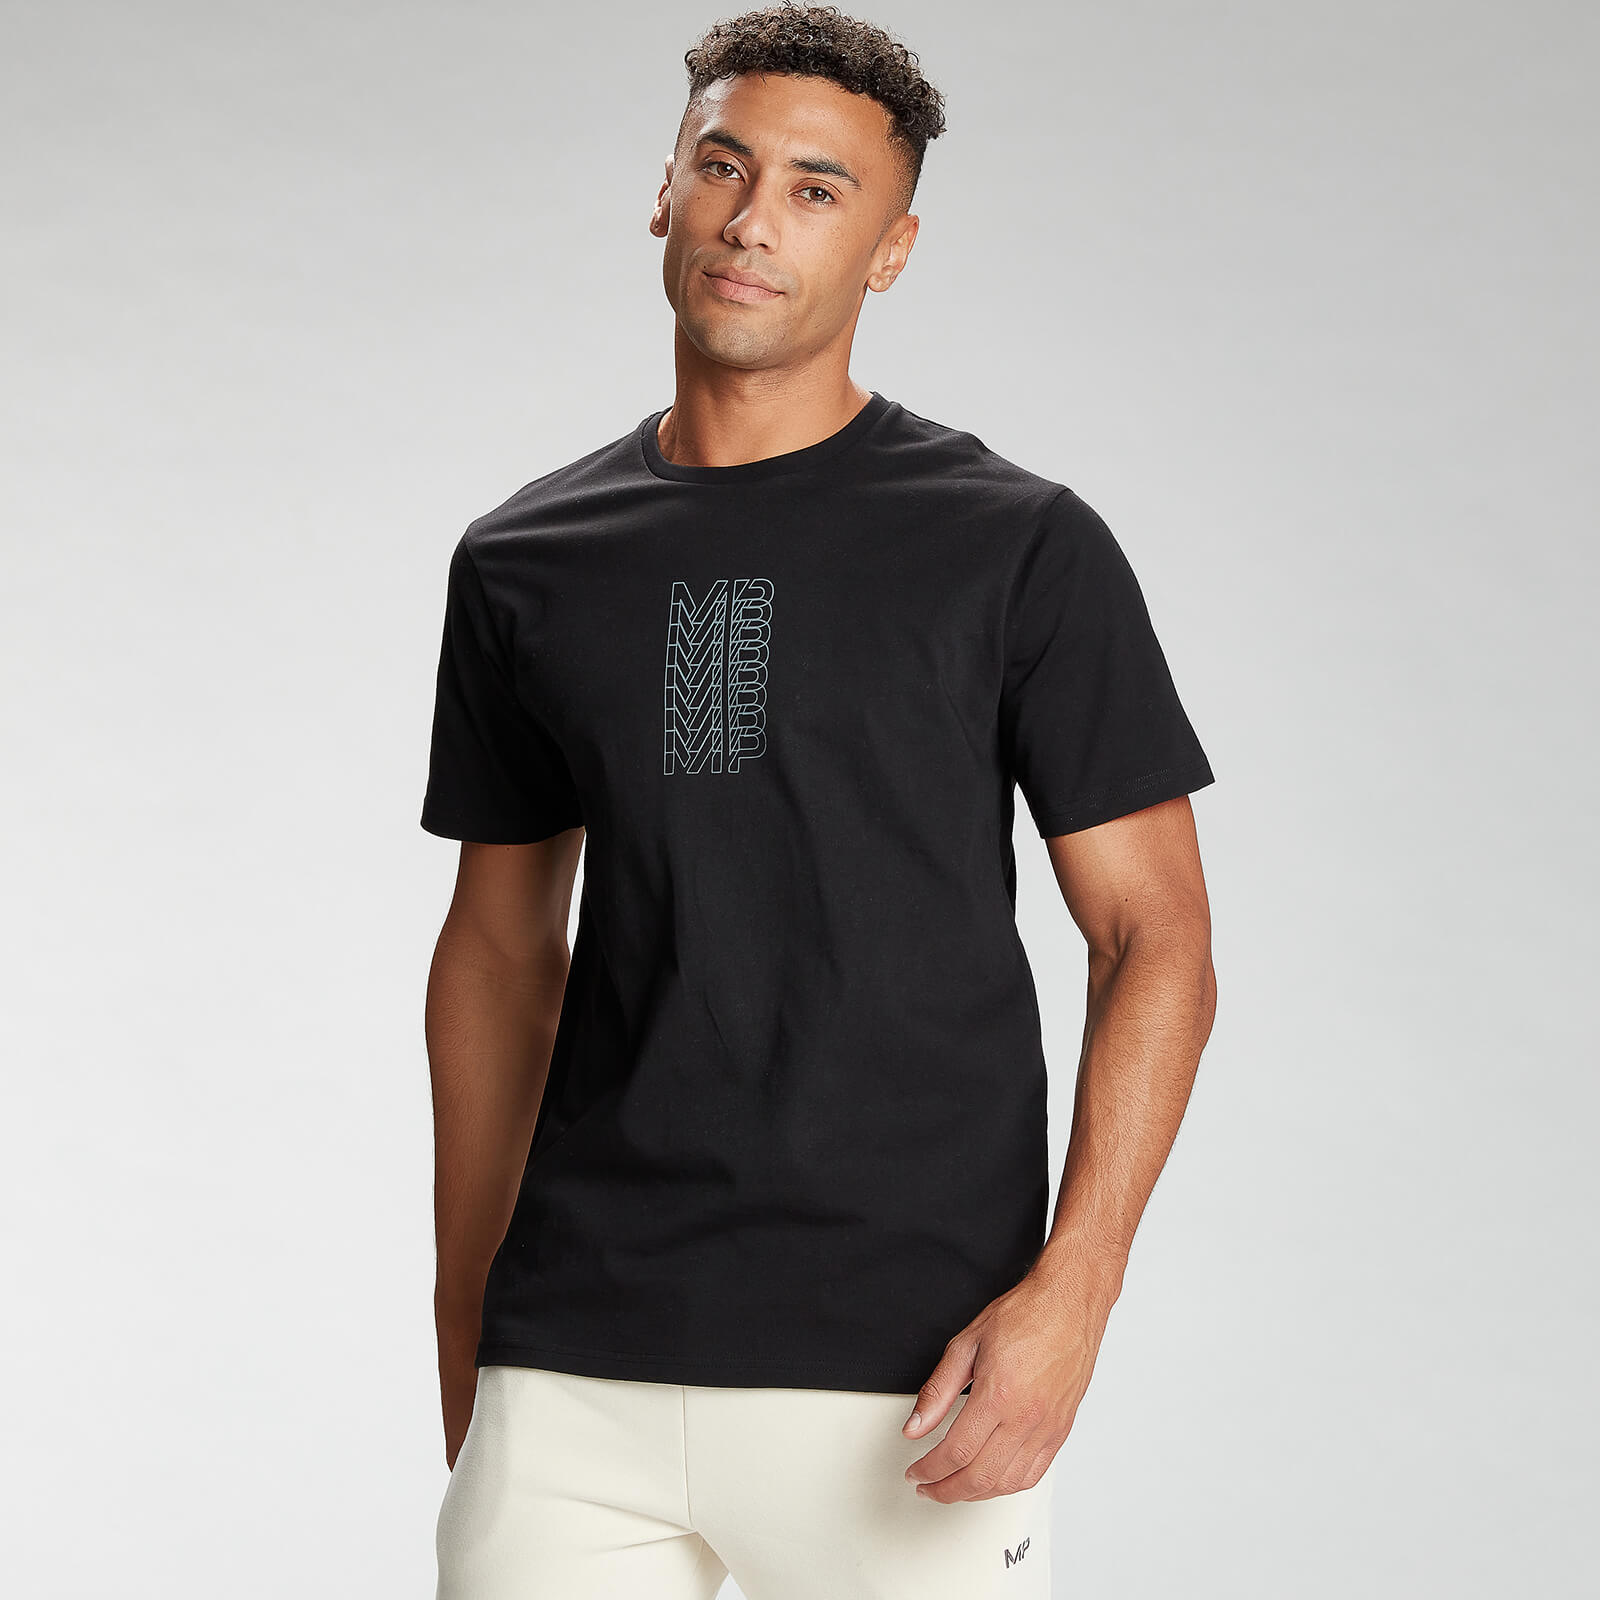 Купить MP Men's Repeat MP Graphic Short Sleeve T-Shirt - Black - XS, Myprotein International